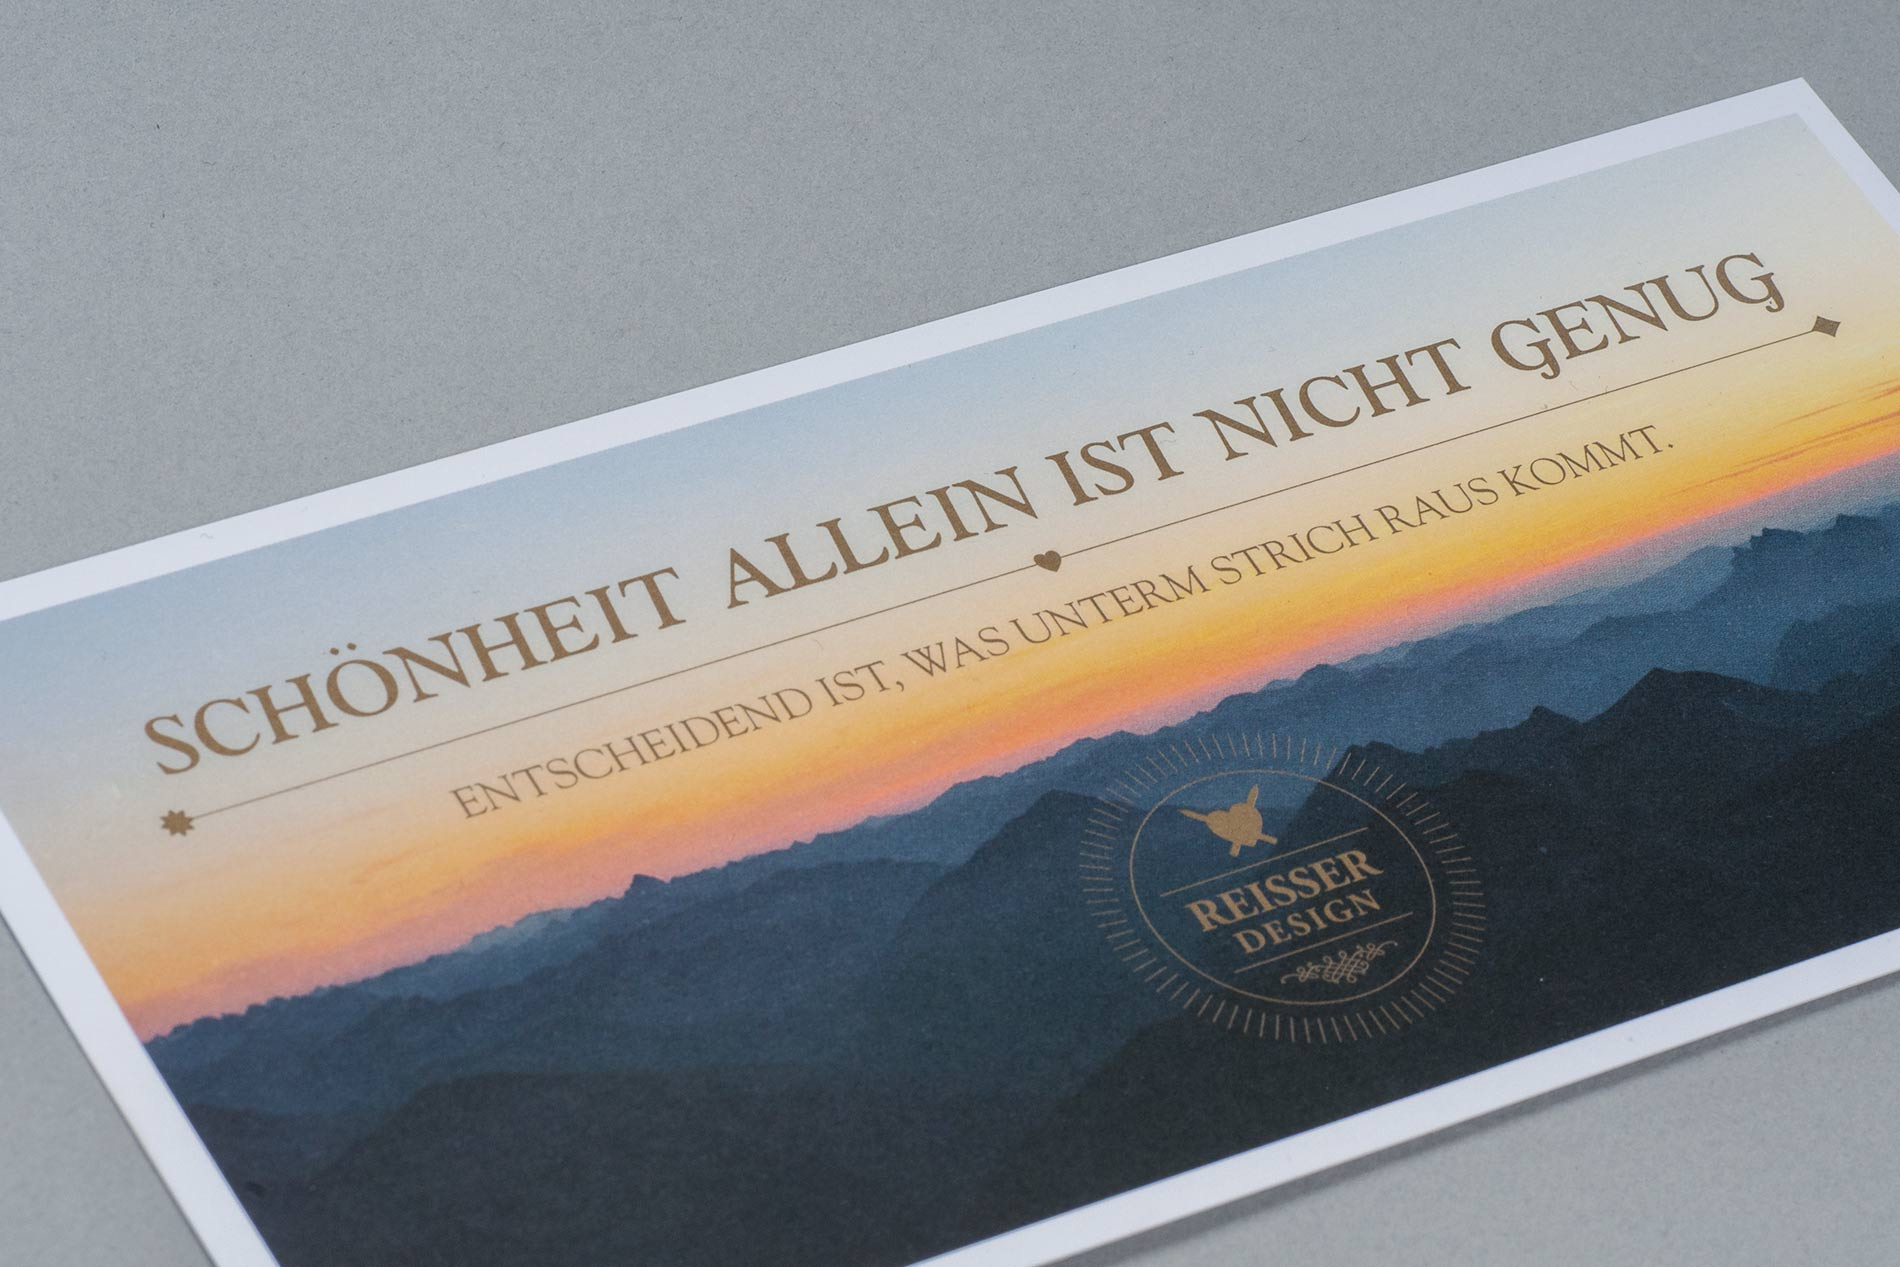 Janina-Lermer-Markengestaltung-Branddesign-Corporate-Design-Reisserdesign-Grusskarte-Greetingcard